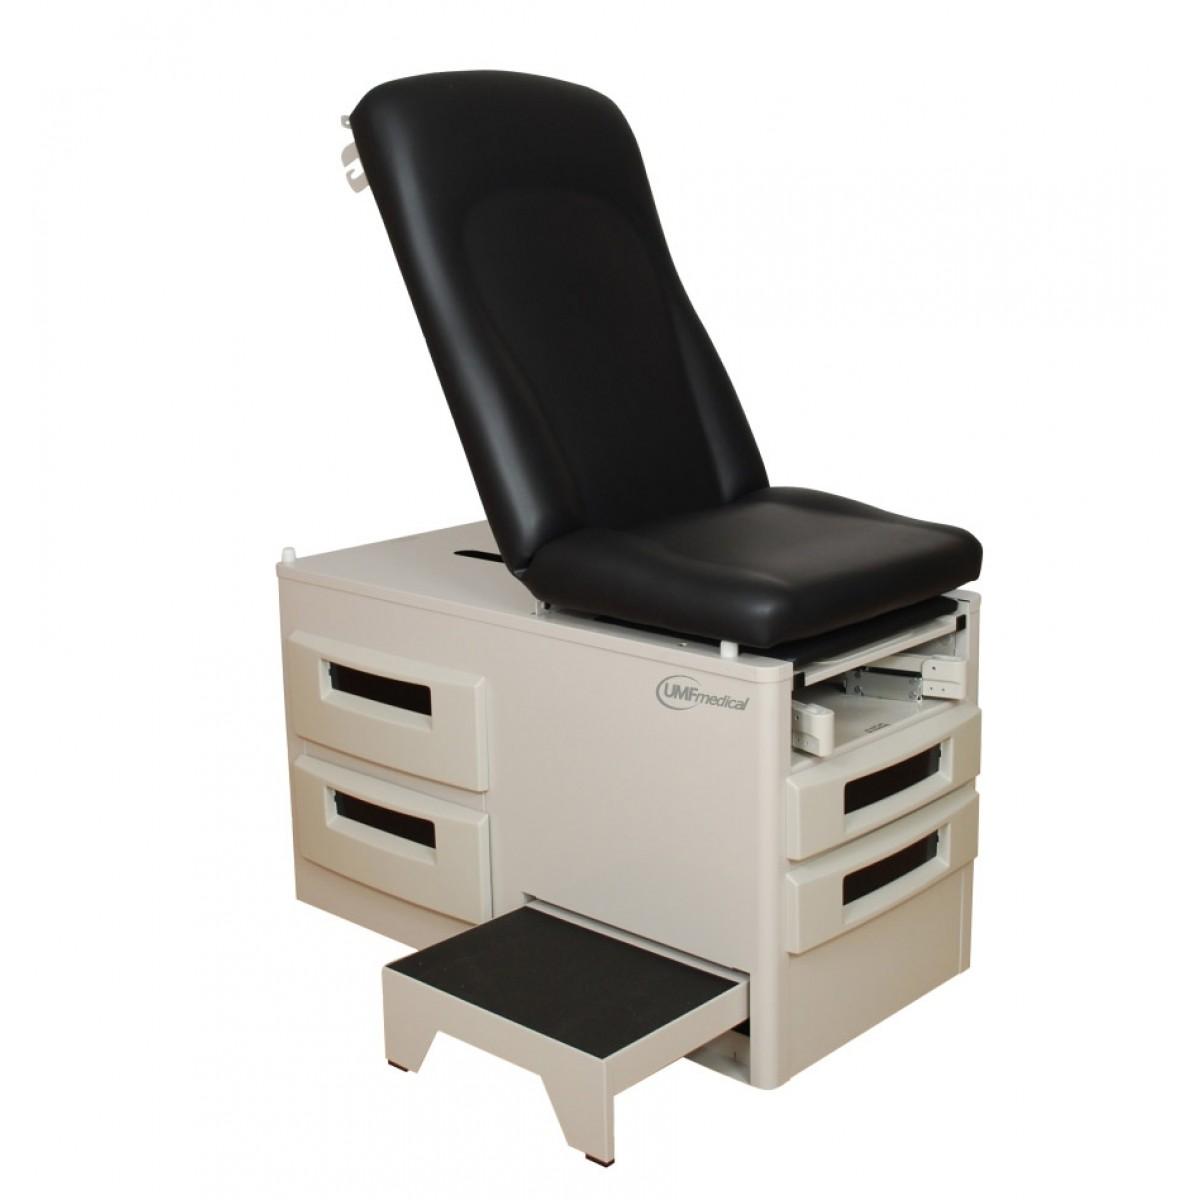 Examination Table Healthcare Exam Table Power Exam Chair